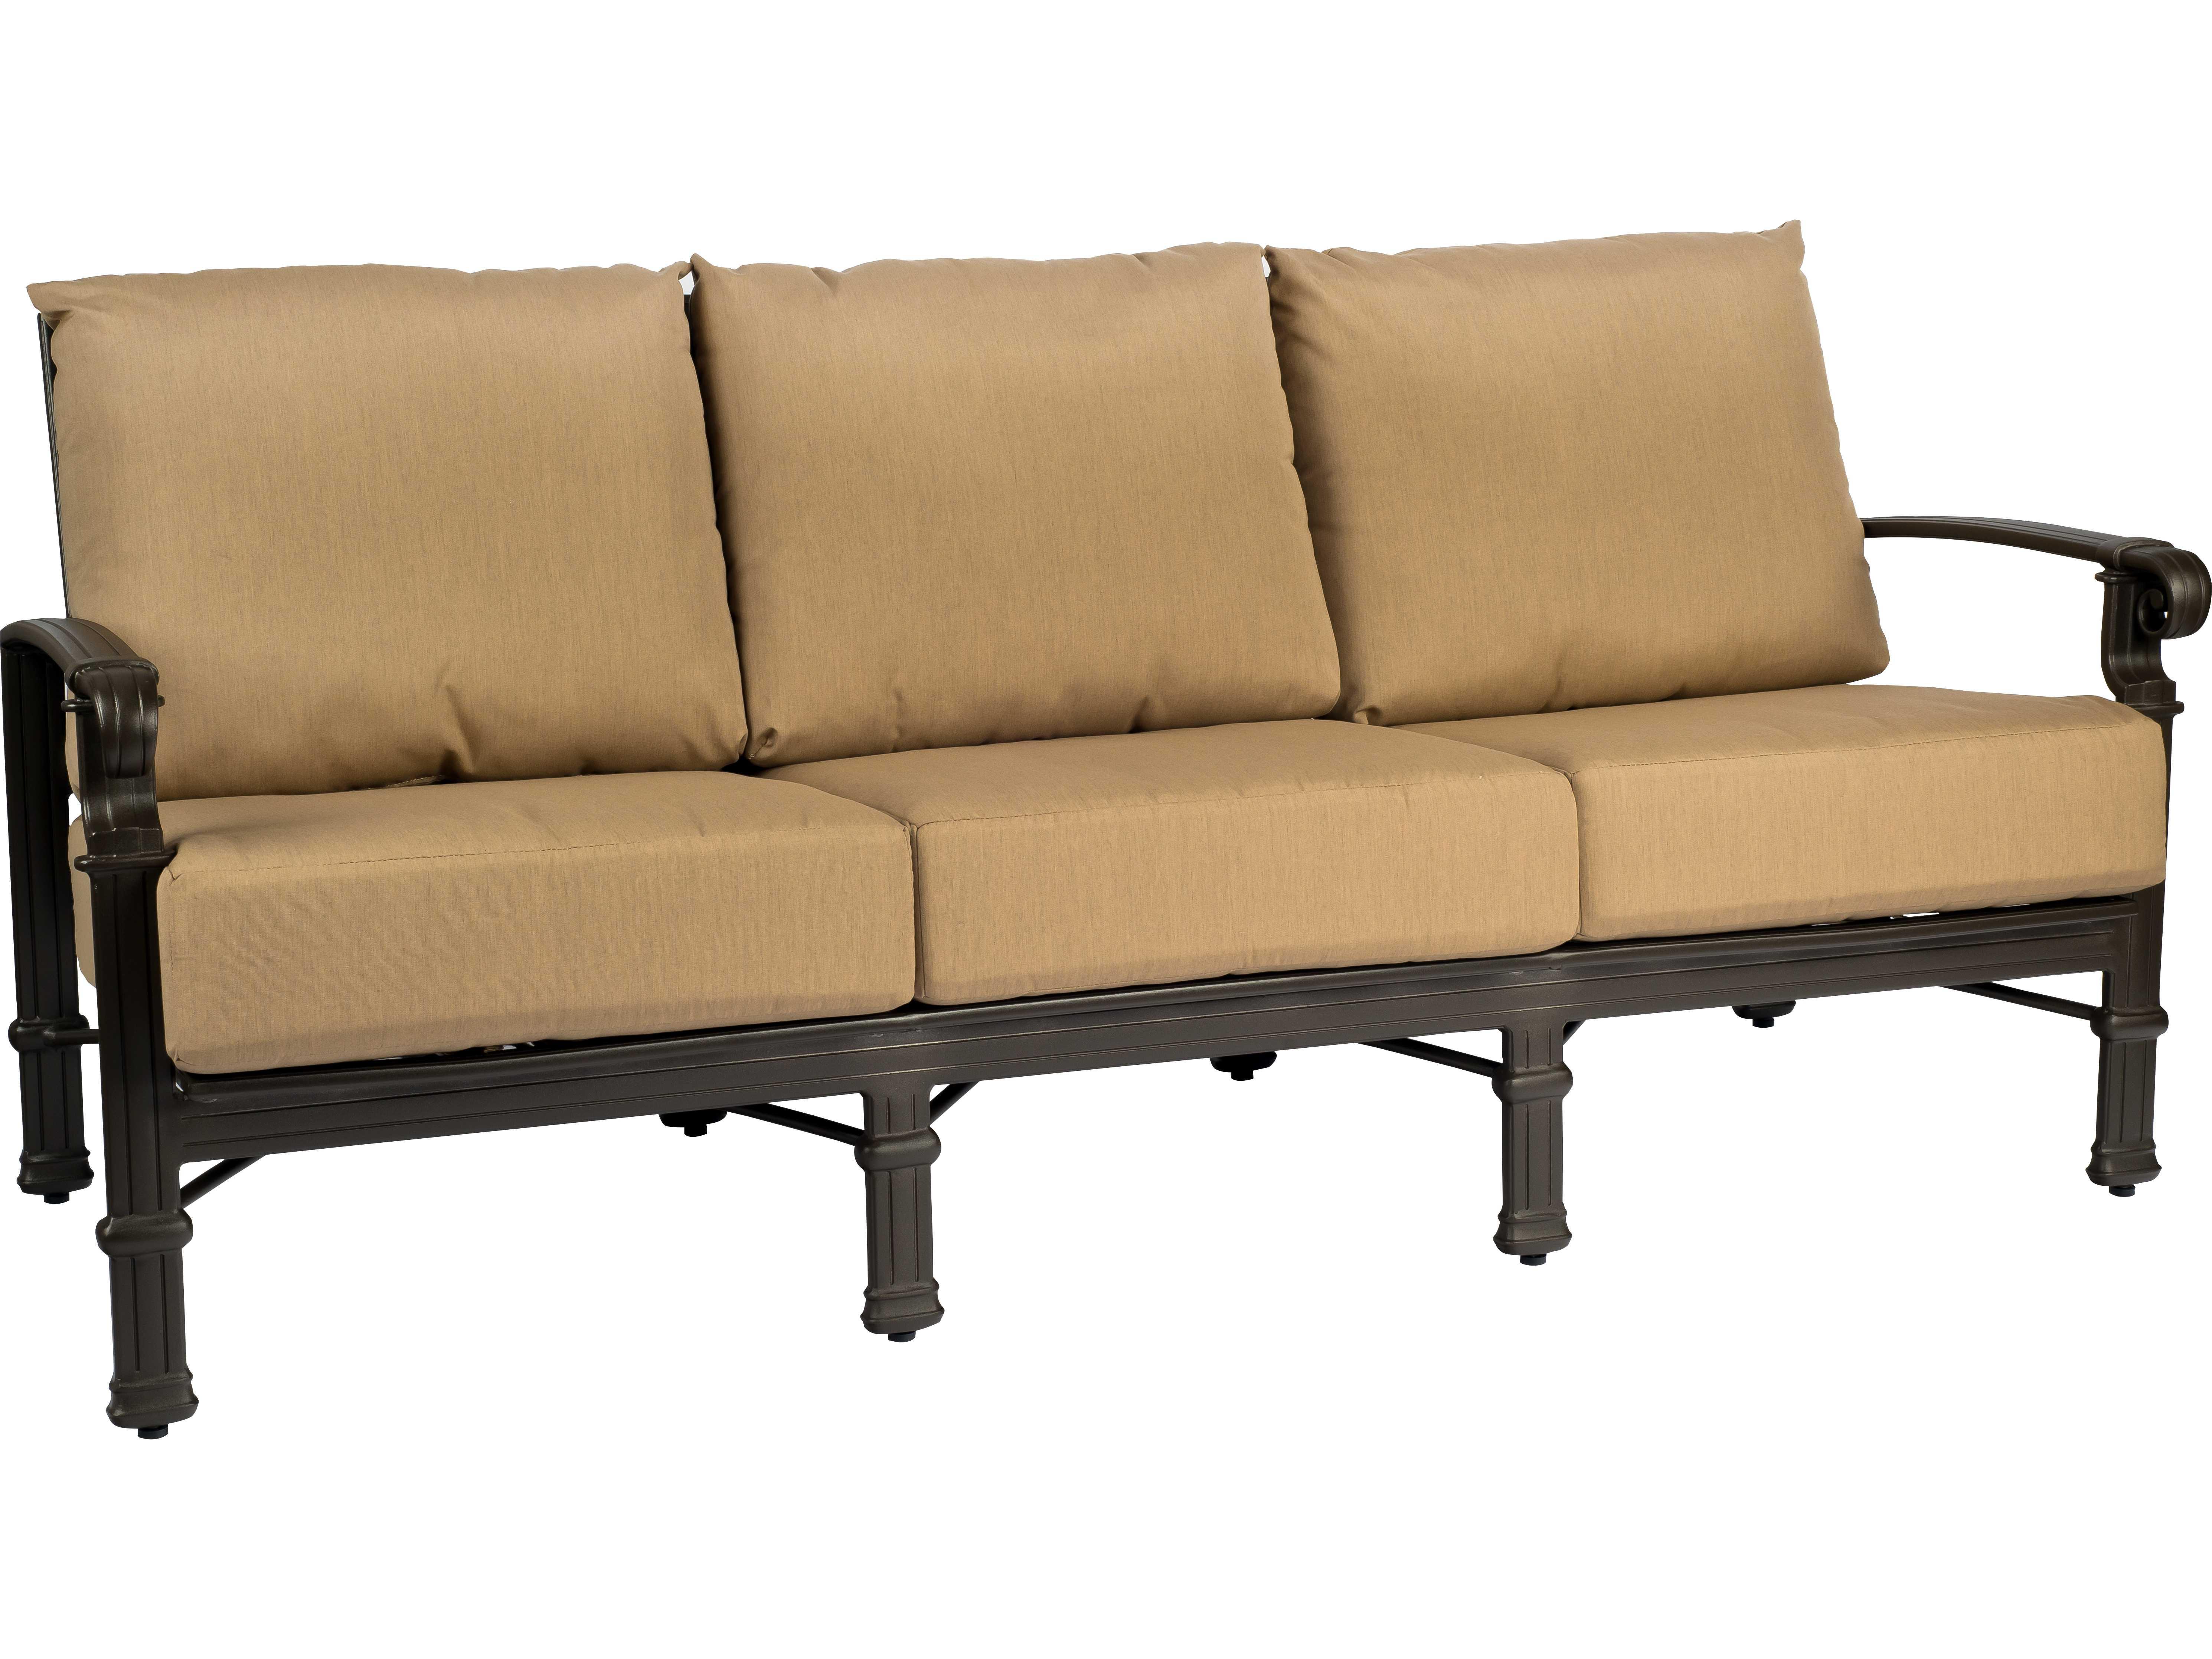 spartan sofa unique sofas and chairs woodard cast aluminum lounge set wrspartanlngeset3